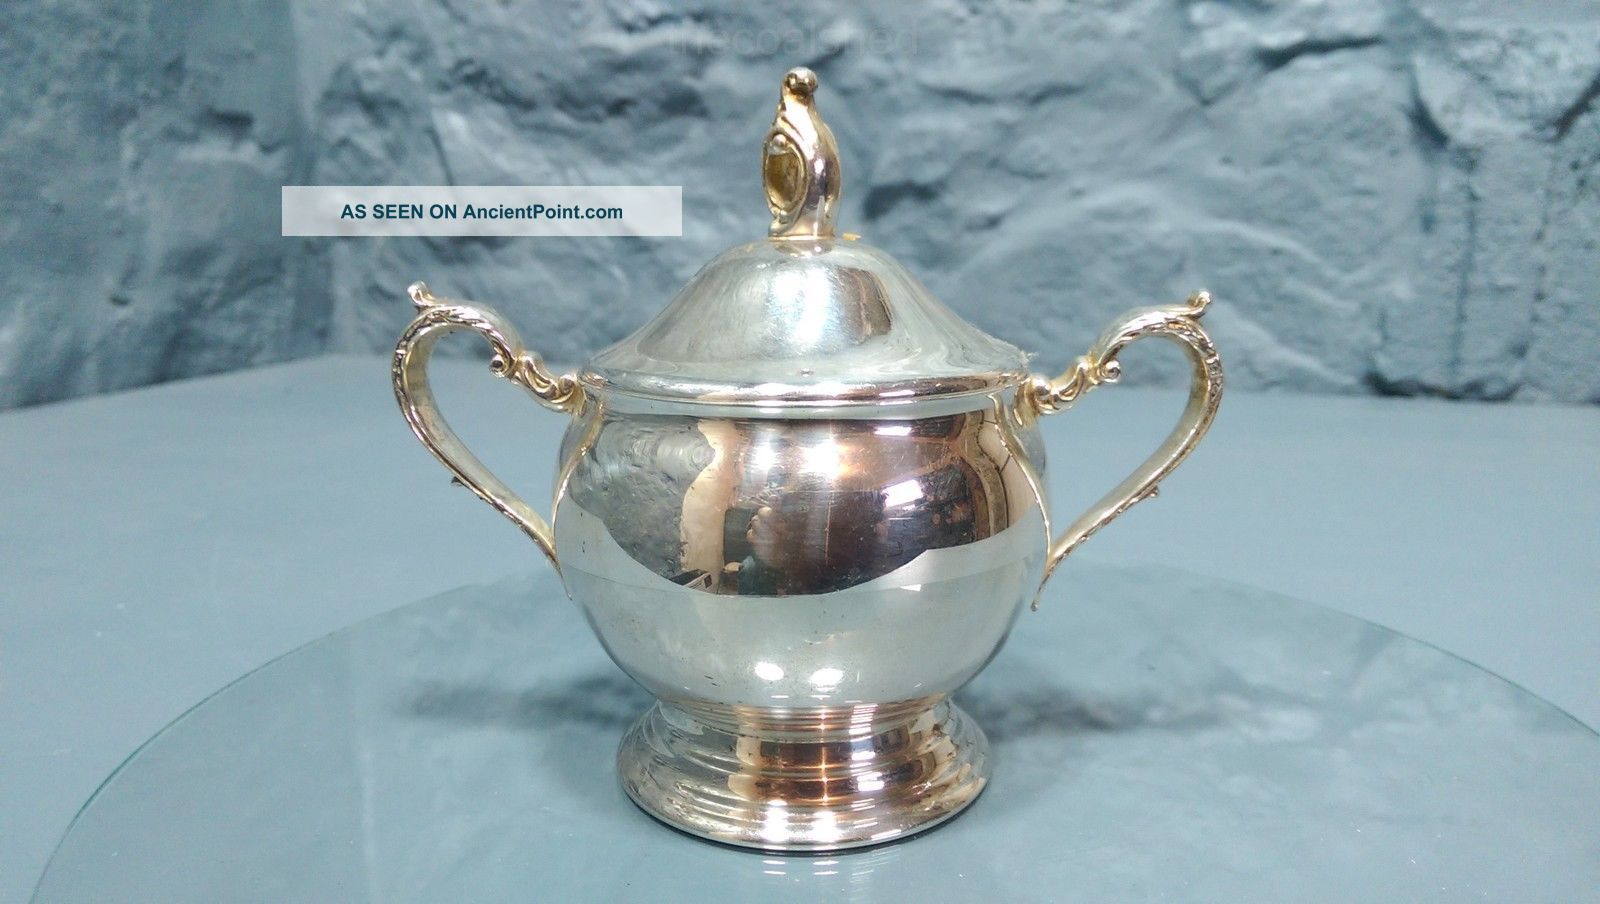 Vintage Viners Silver Plated Lidded Sugar Bowl Sheffield England (29) Sugar Bowls/Tongs photo